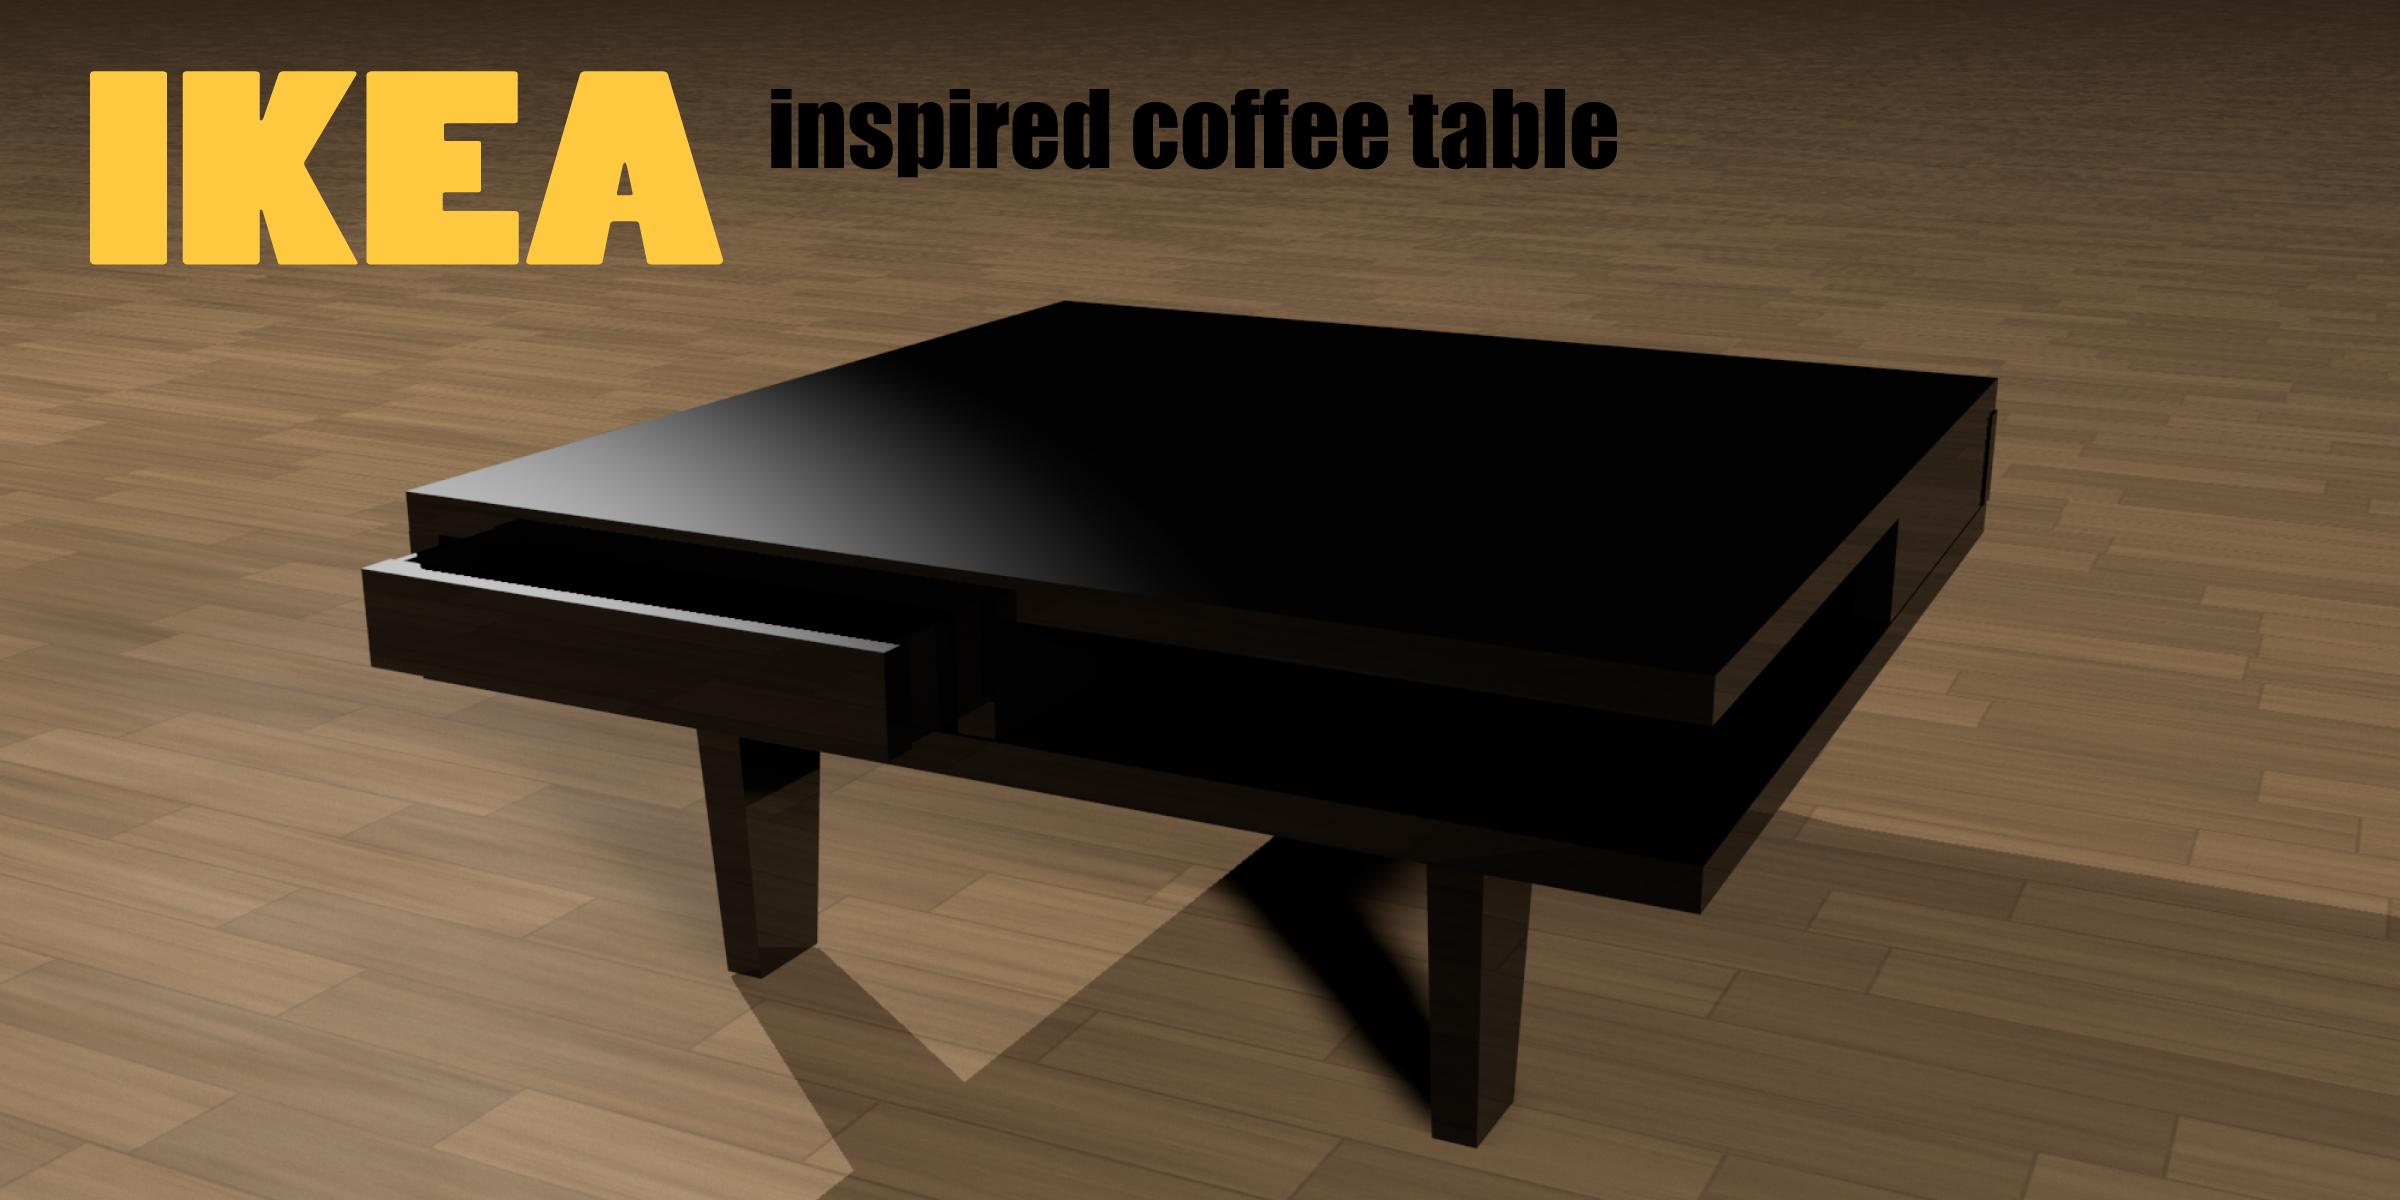 Ikea Inspired Coffee Table By Integritydesign On Deviantart